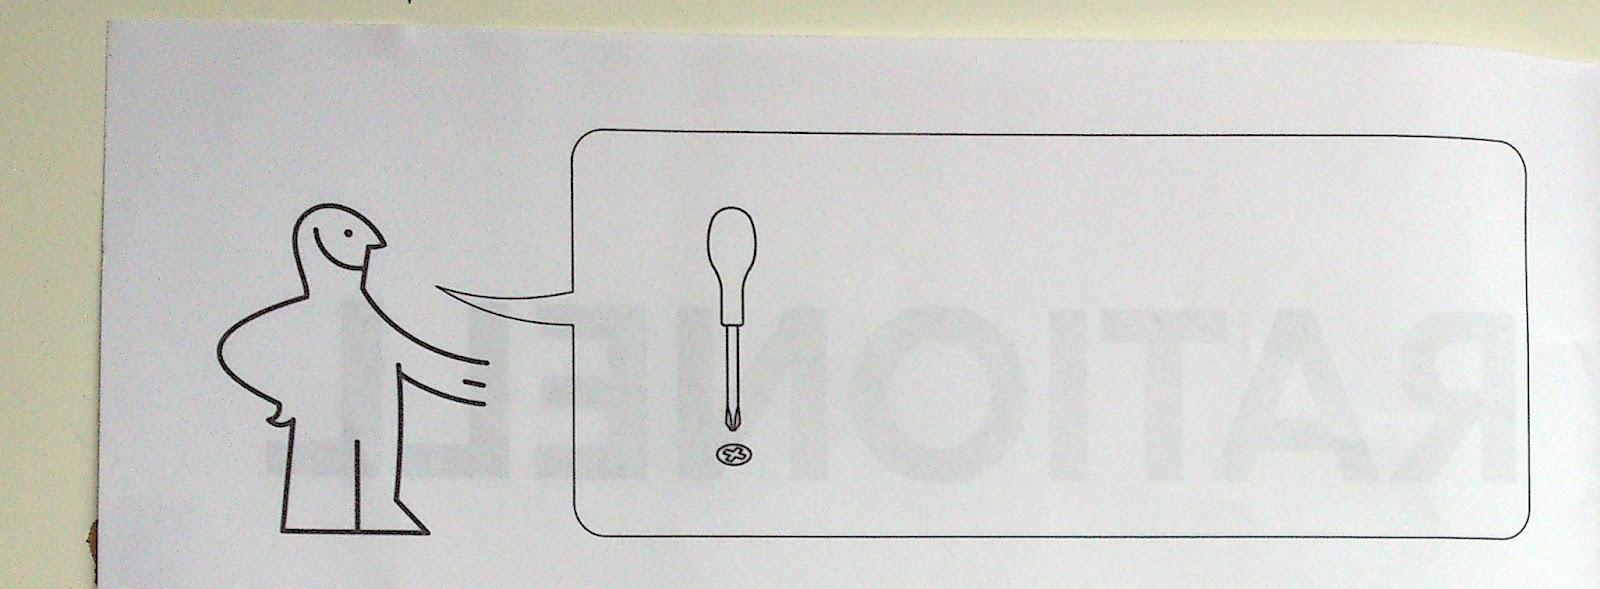 A Quoi Ressemblent Les Temps De Crises Chez Ikea